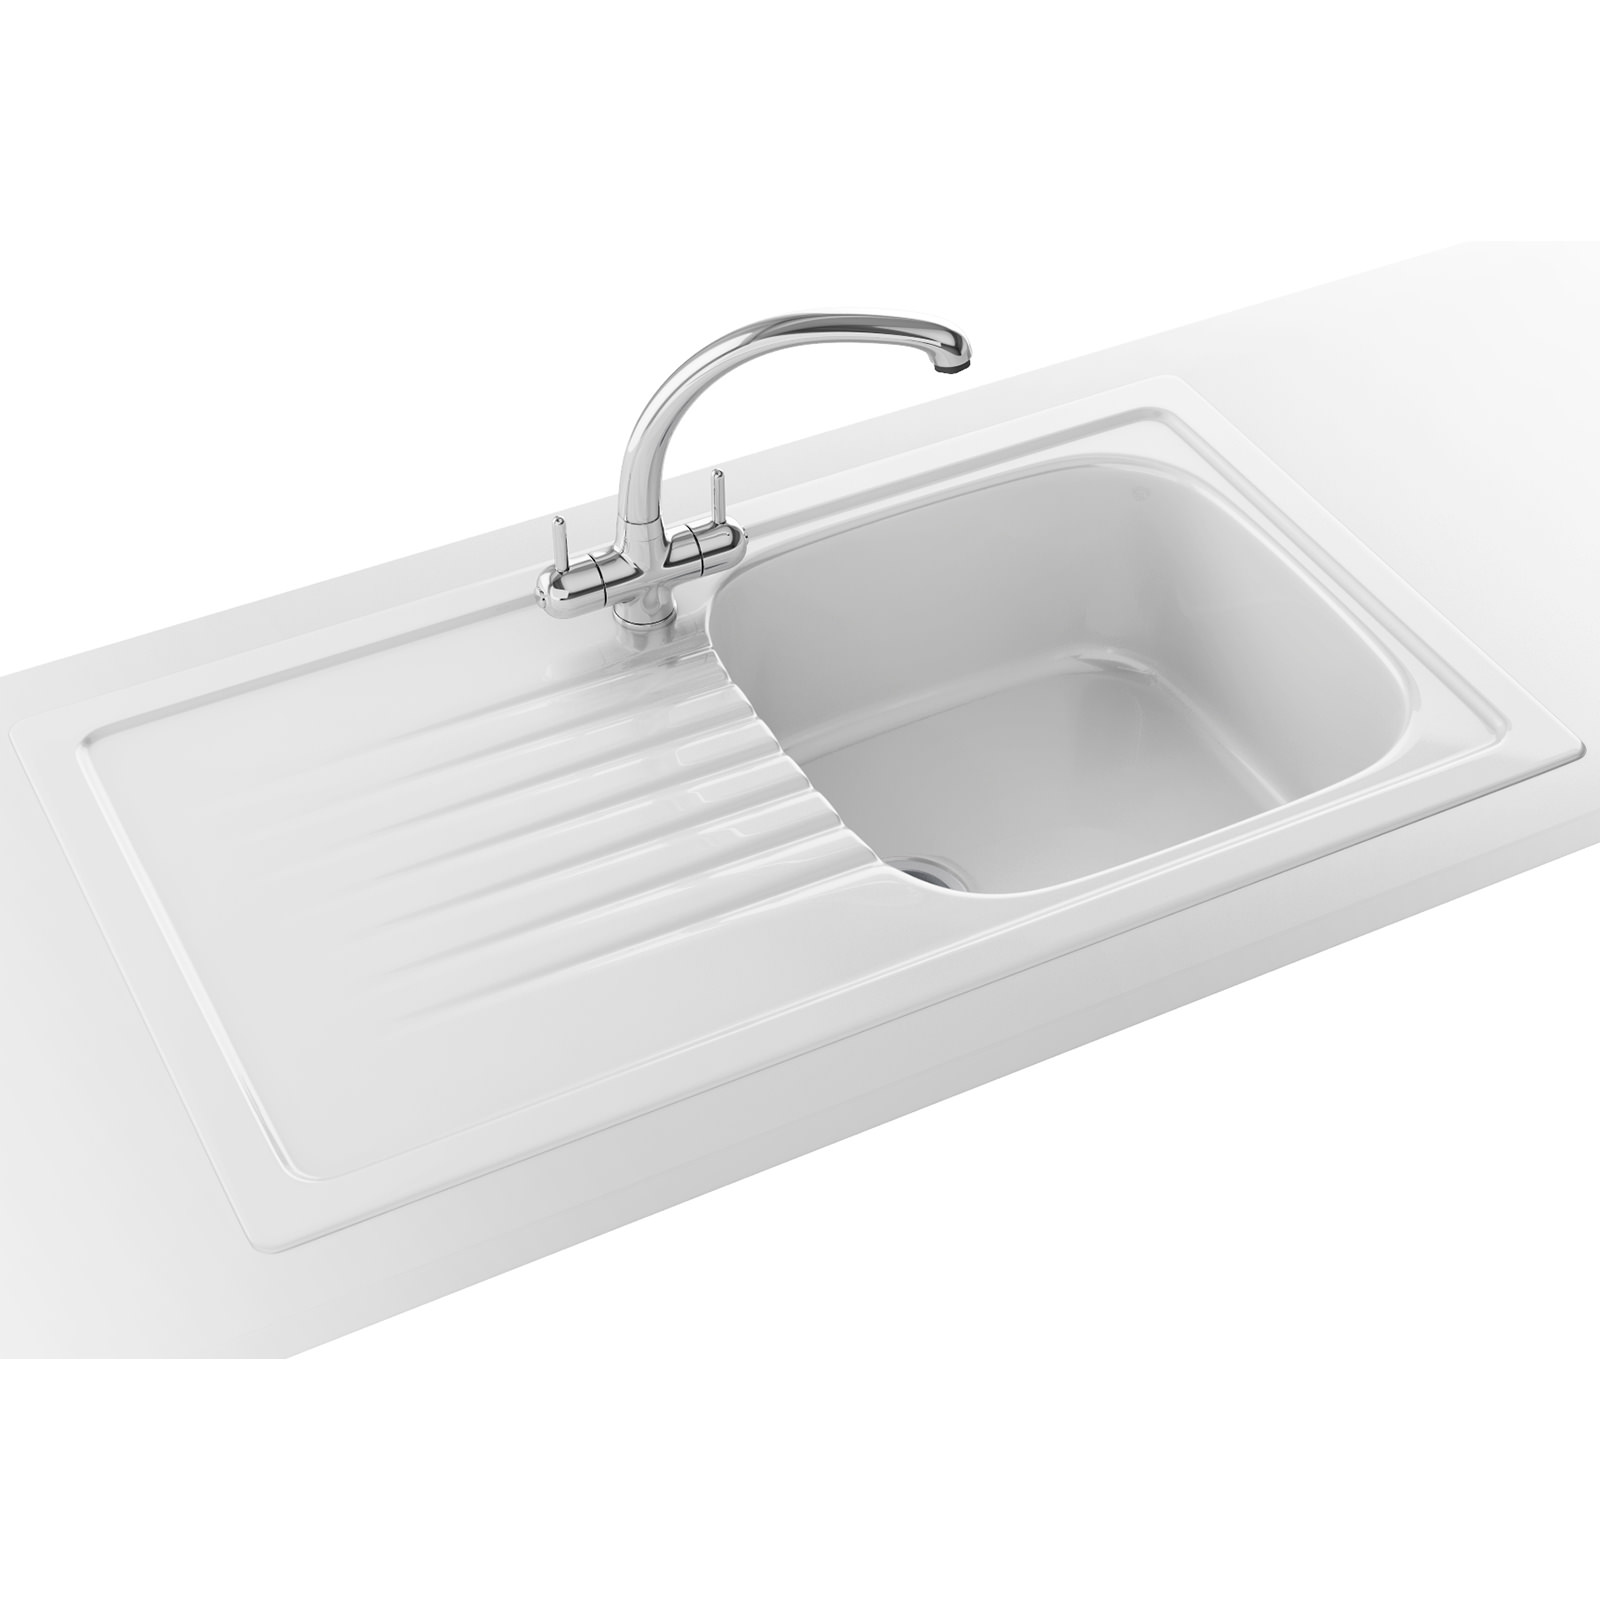 Franke Elba ELK 611 Ceramic White 1.0 Bowl Kitchen Inset Sink ...